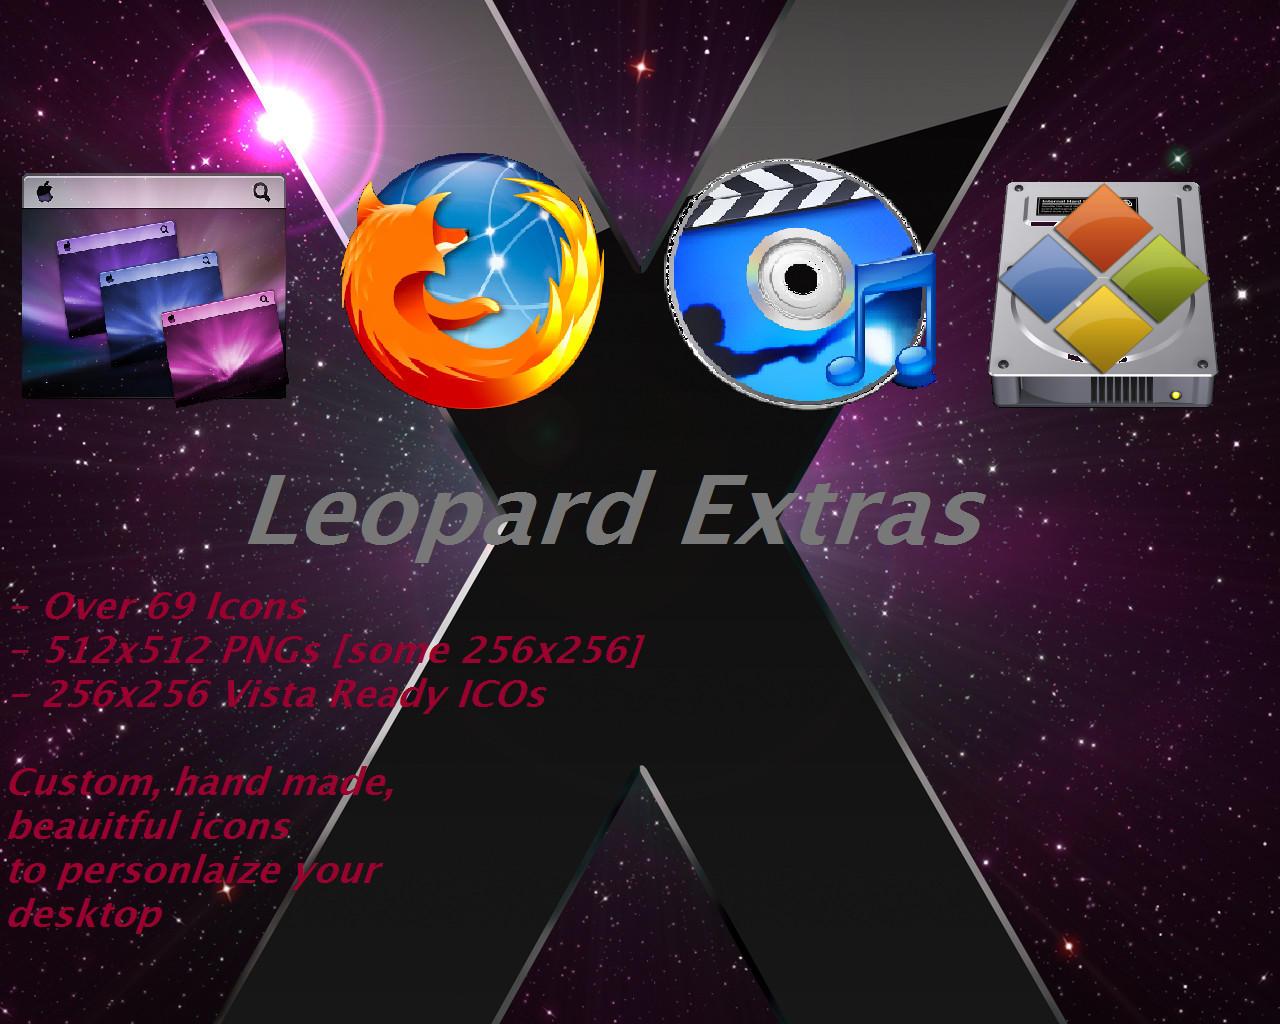 Leopard Extras by Maikeru-sama